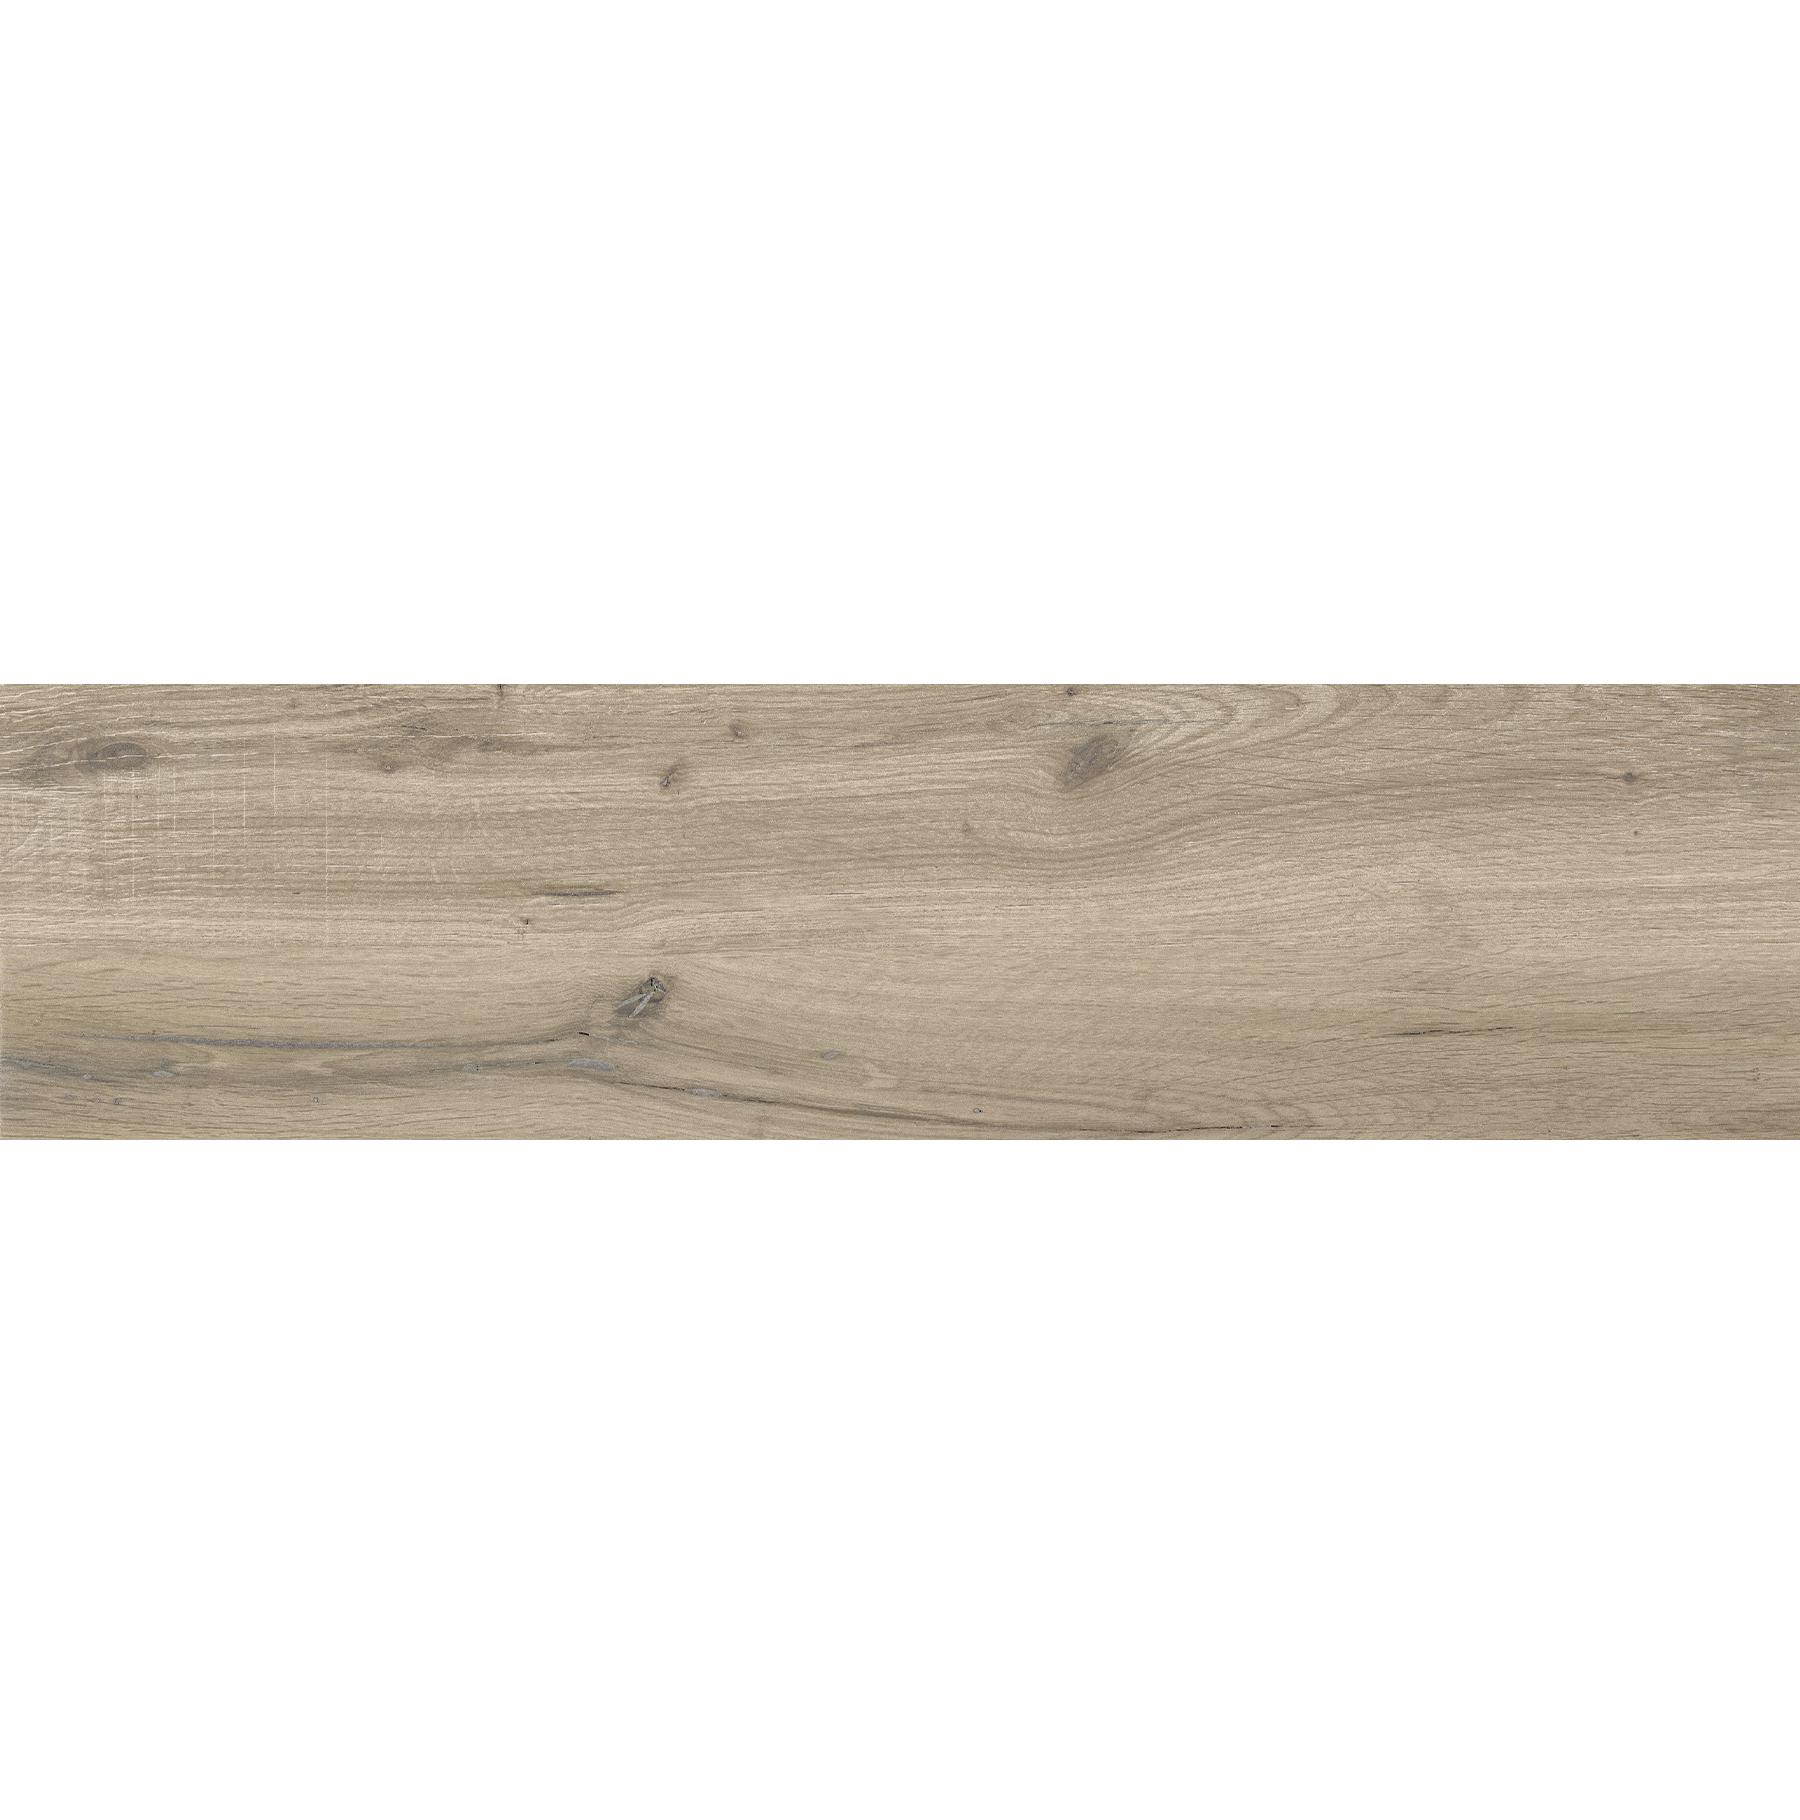 Star Gres Dublin Almond Gres 15 5x62 Gat 1 5907641447179 Plytki Plytki Do Salonu Plytki Ceramiczne Sklep Internetowy Eplytki Pl